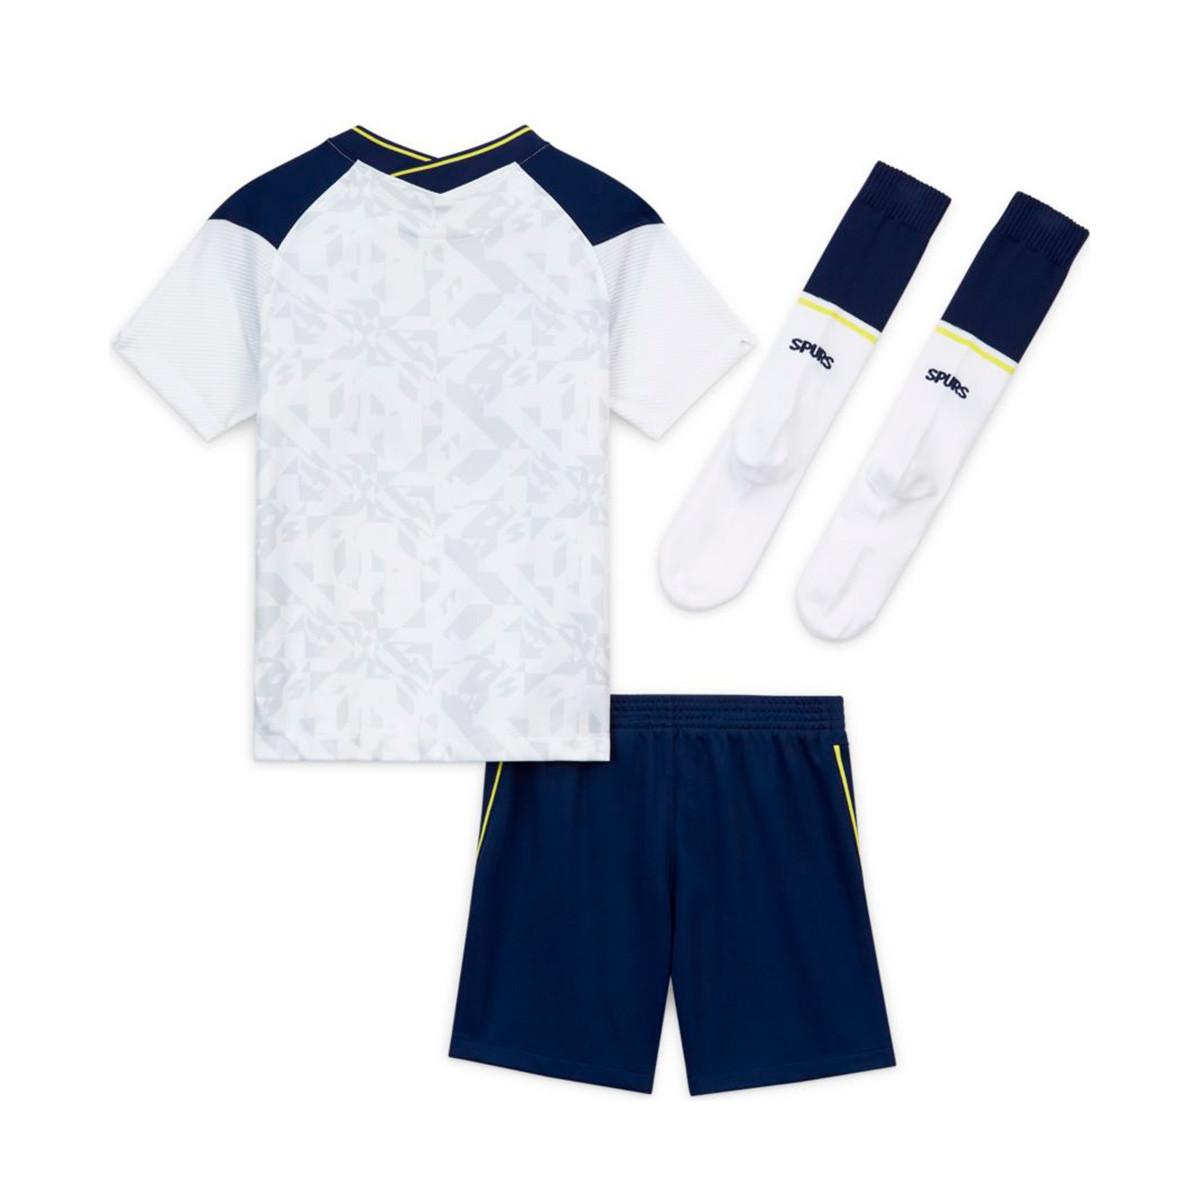 Kit Nike Tottenham Hotspur Fc Primera Equipacion 2020 2021 Nino White Binary Blue Football Store Futbol Emotion